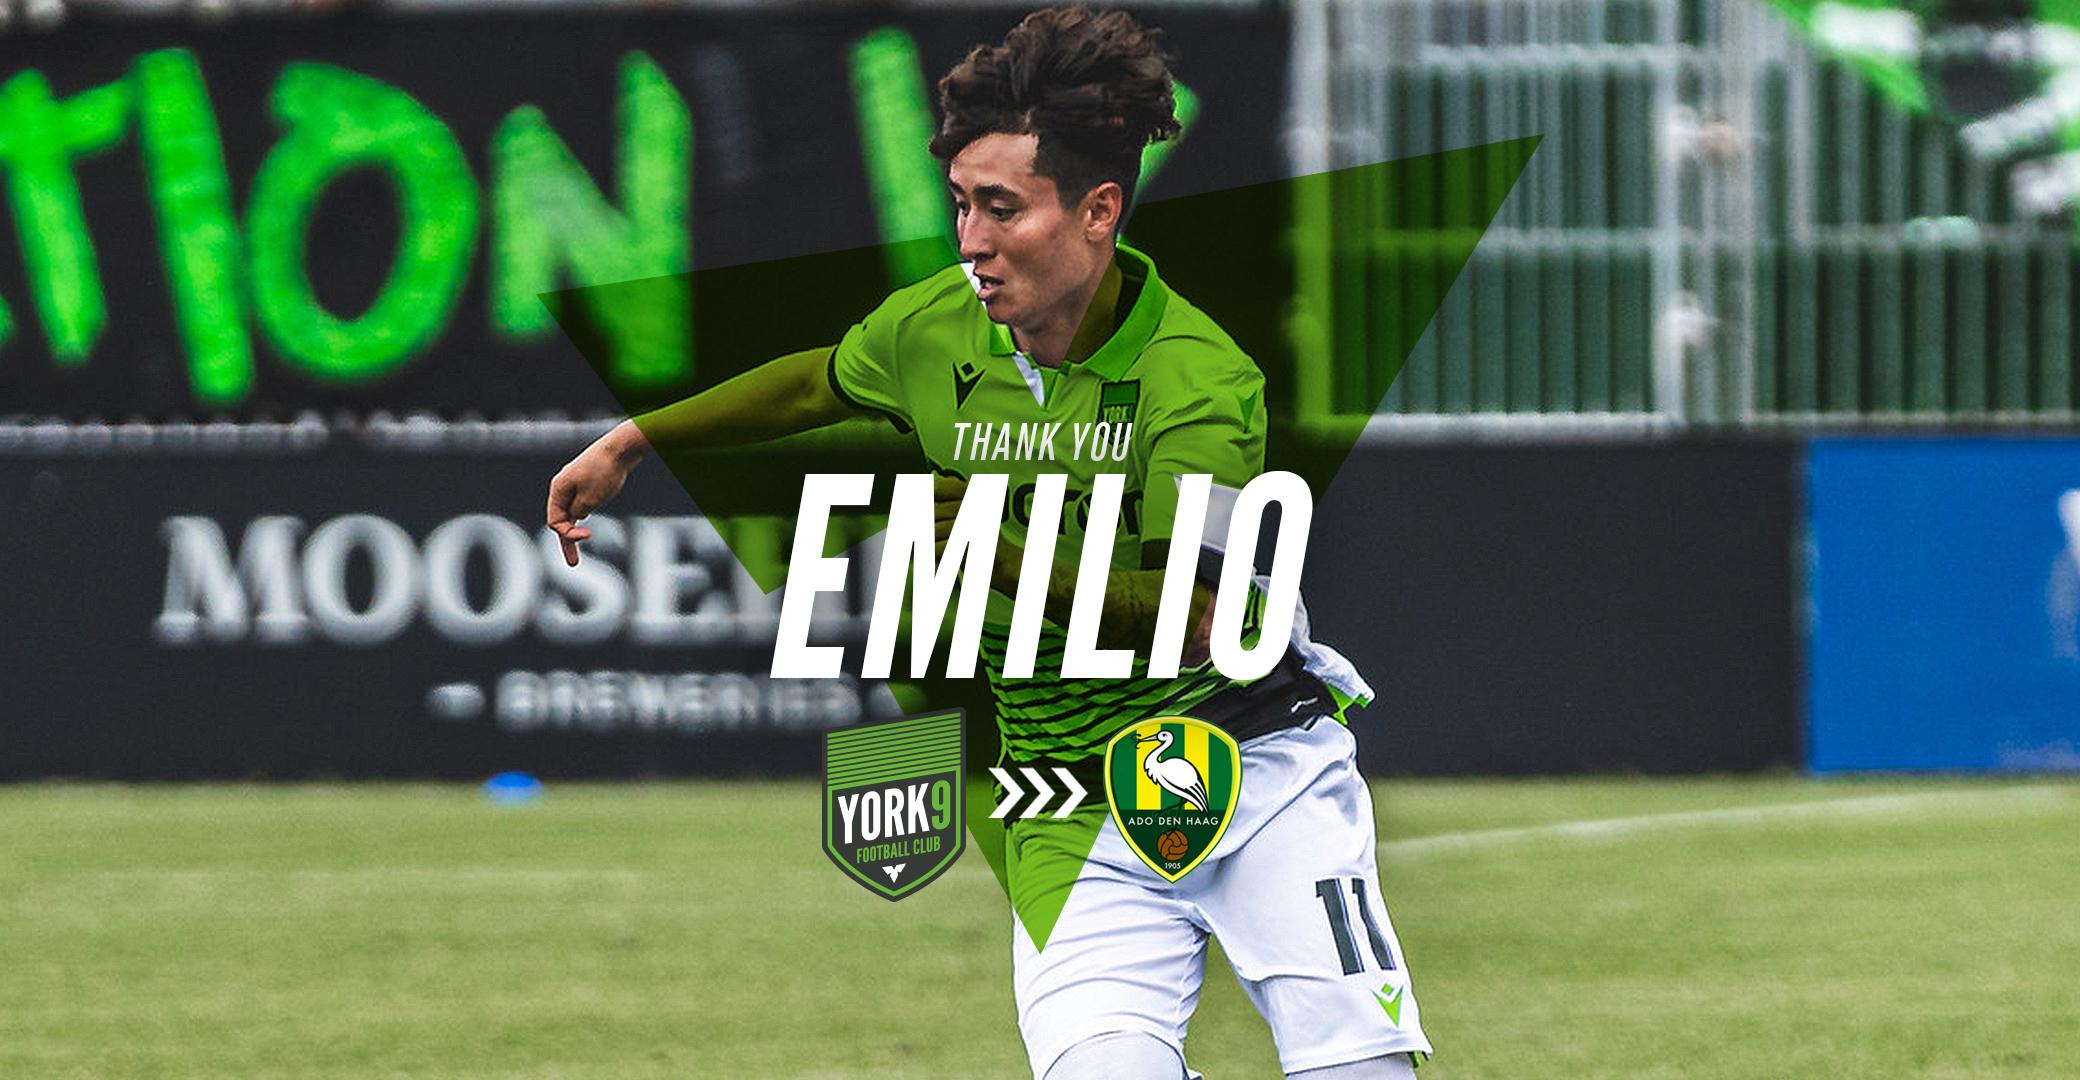 York9 Fc Transfers Midfielder Emilio Estevez To Dutch Eredivise Side Ado Den Haag York United Fc